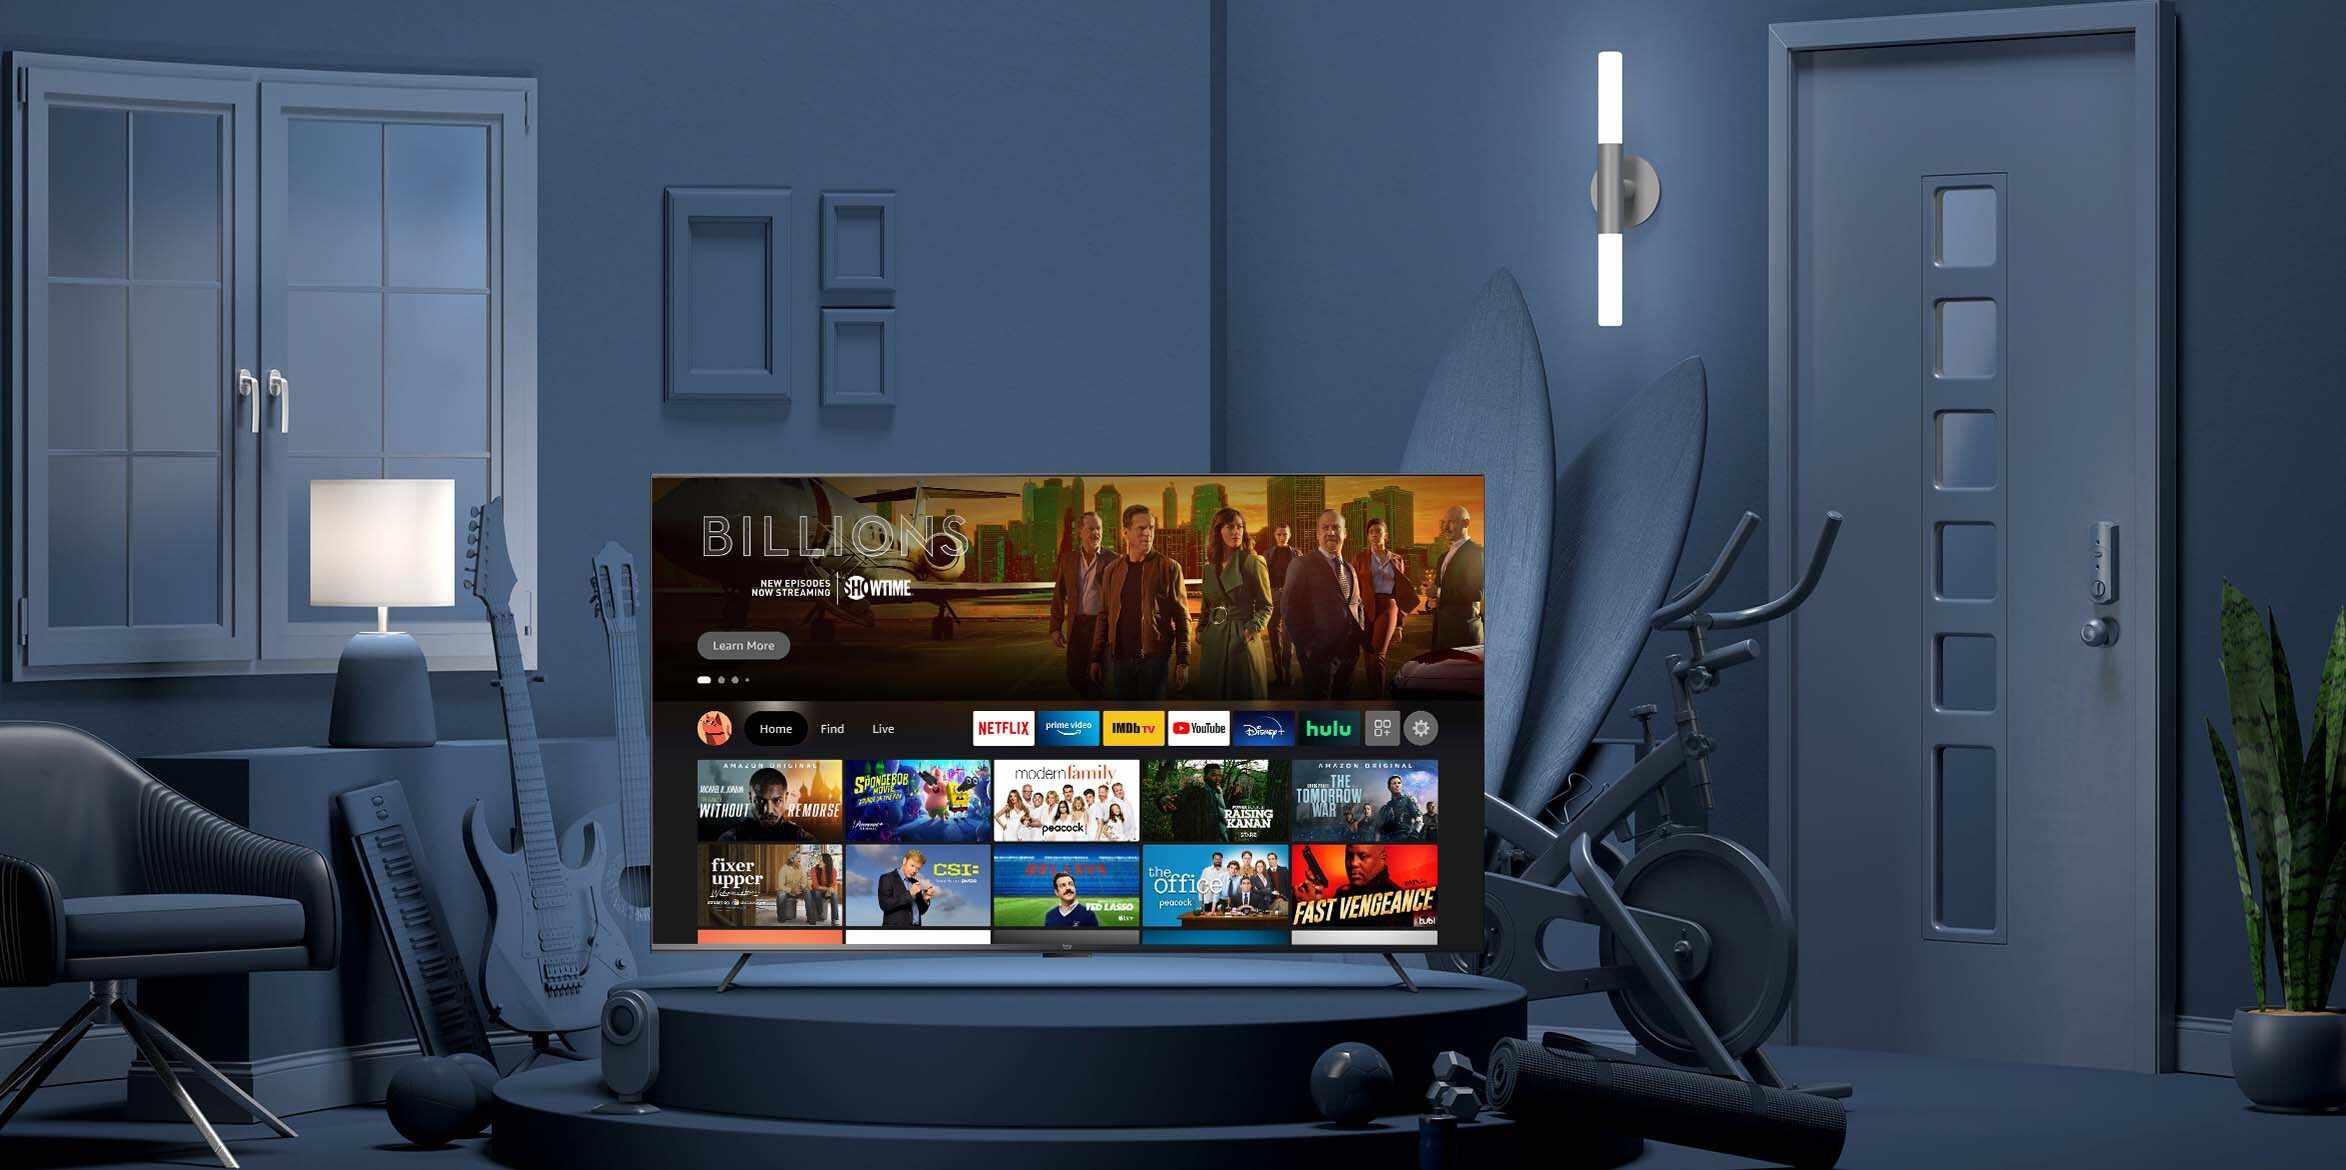 Amazon's new smart TV